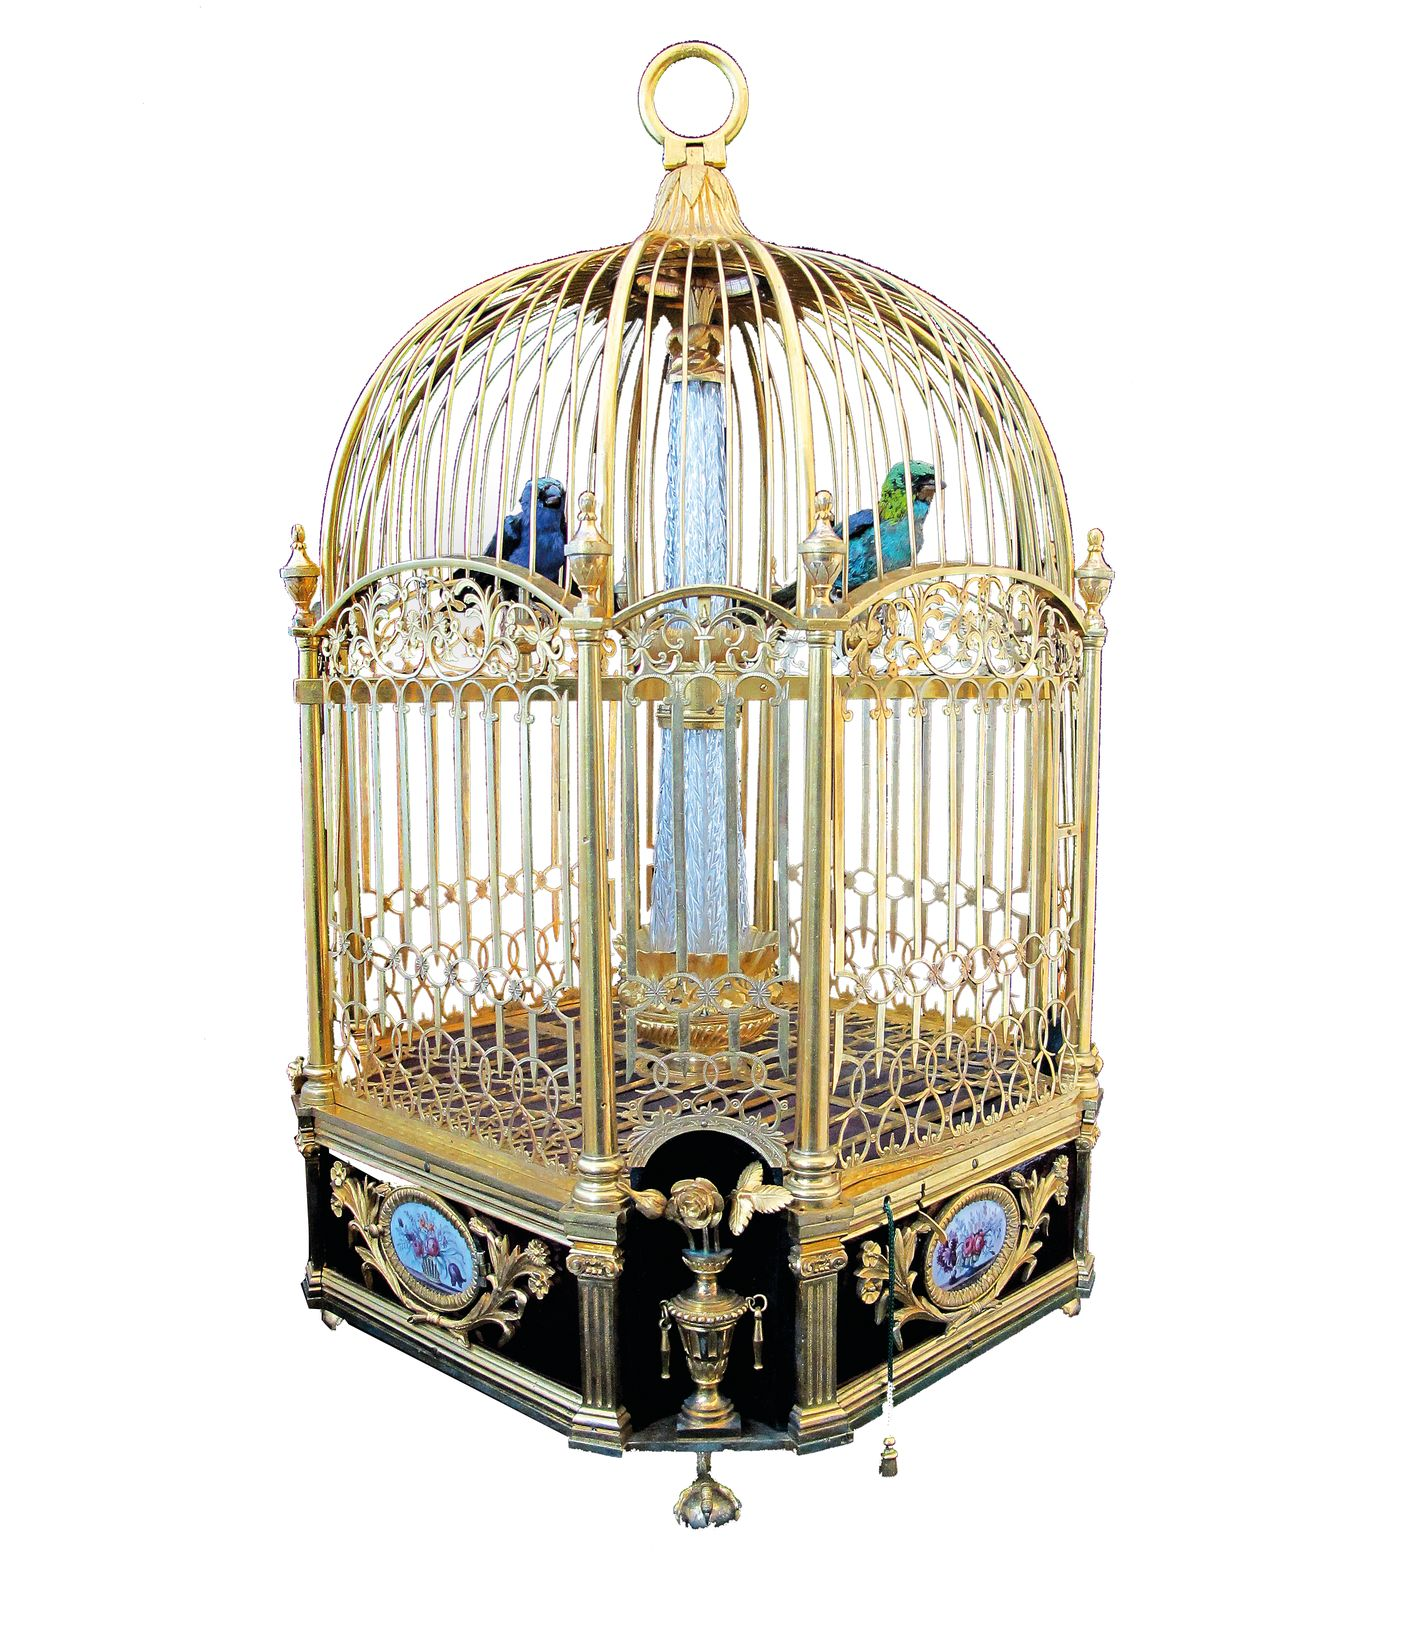 Jaquet-Droz-Singing-Bird-Cage..jpg